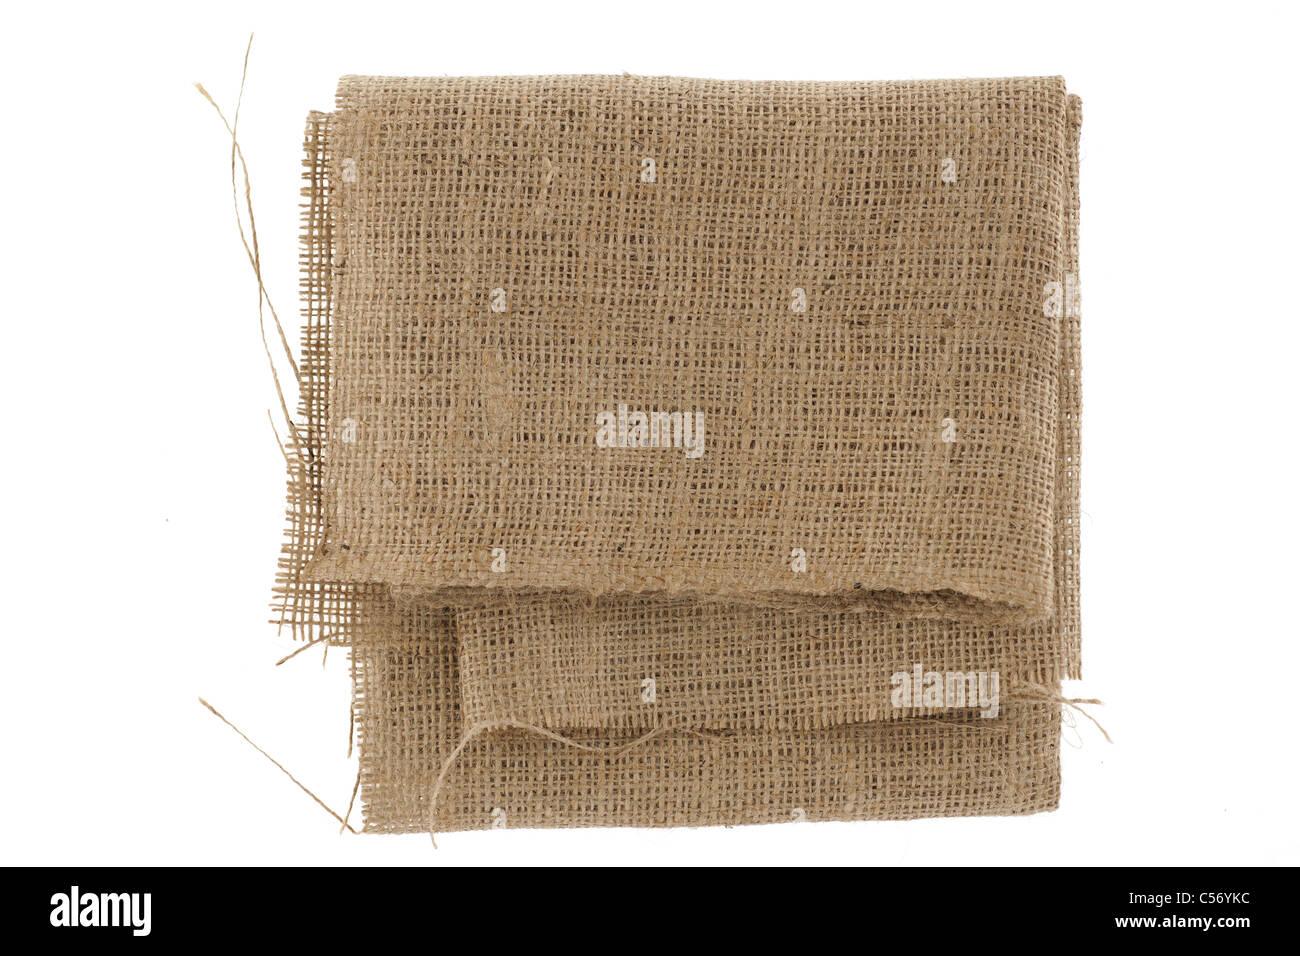 Folded coarse hessian material - Stock Image